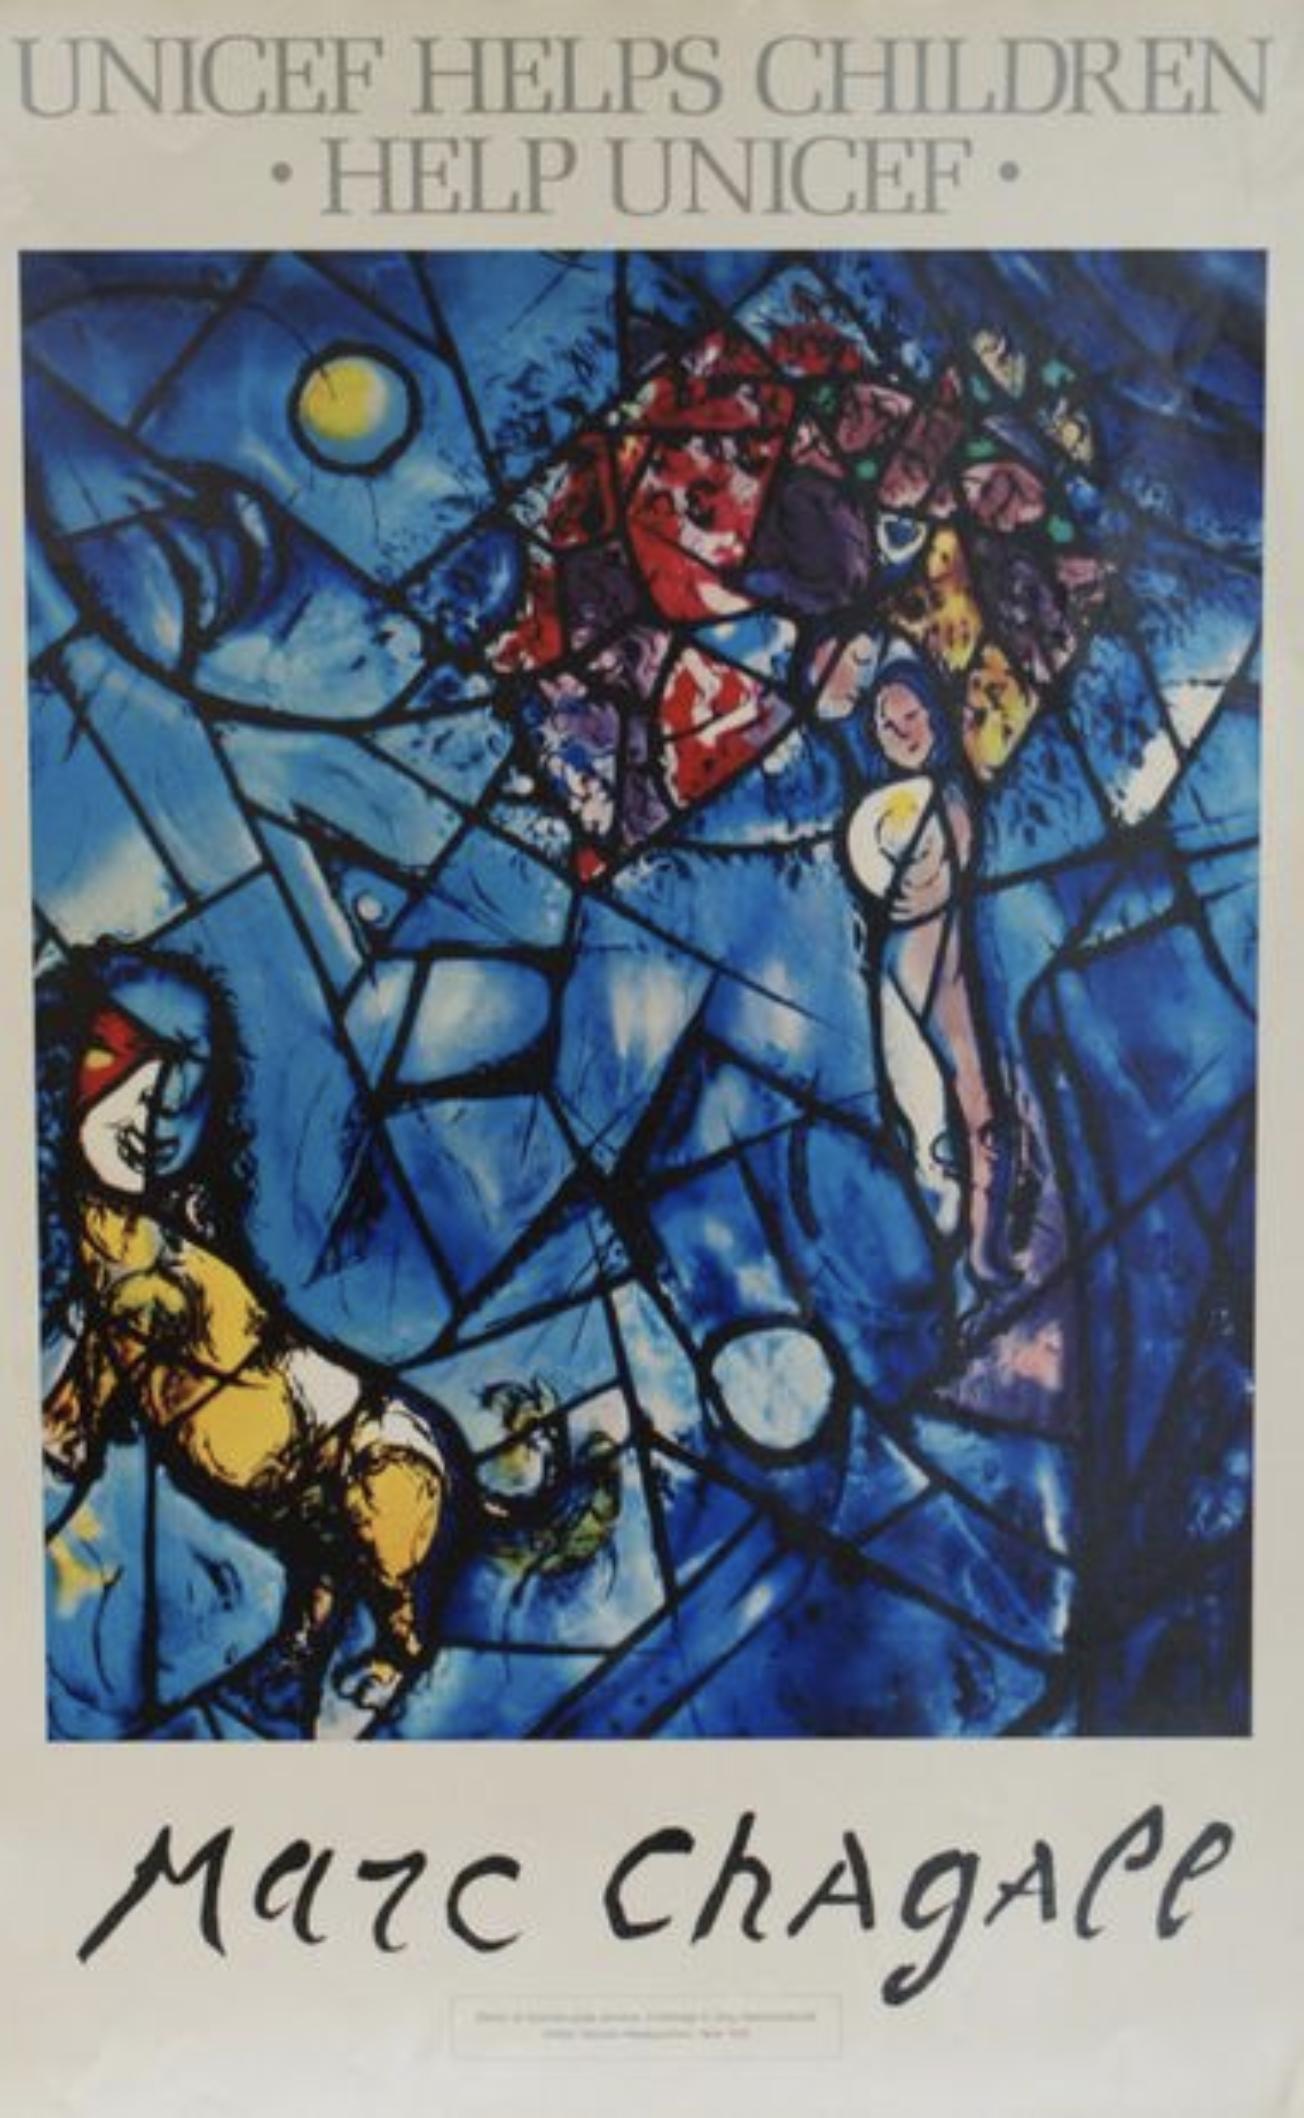 Marc Chagall il poliedro Original Vintage Art Poster